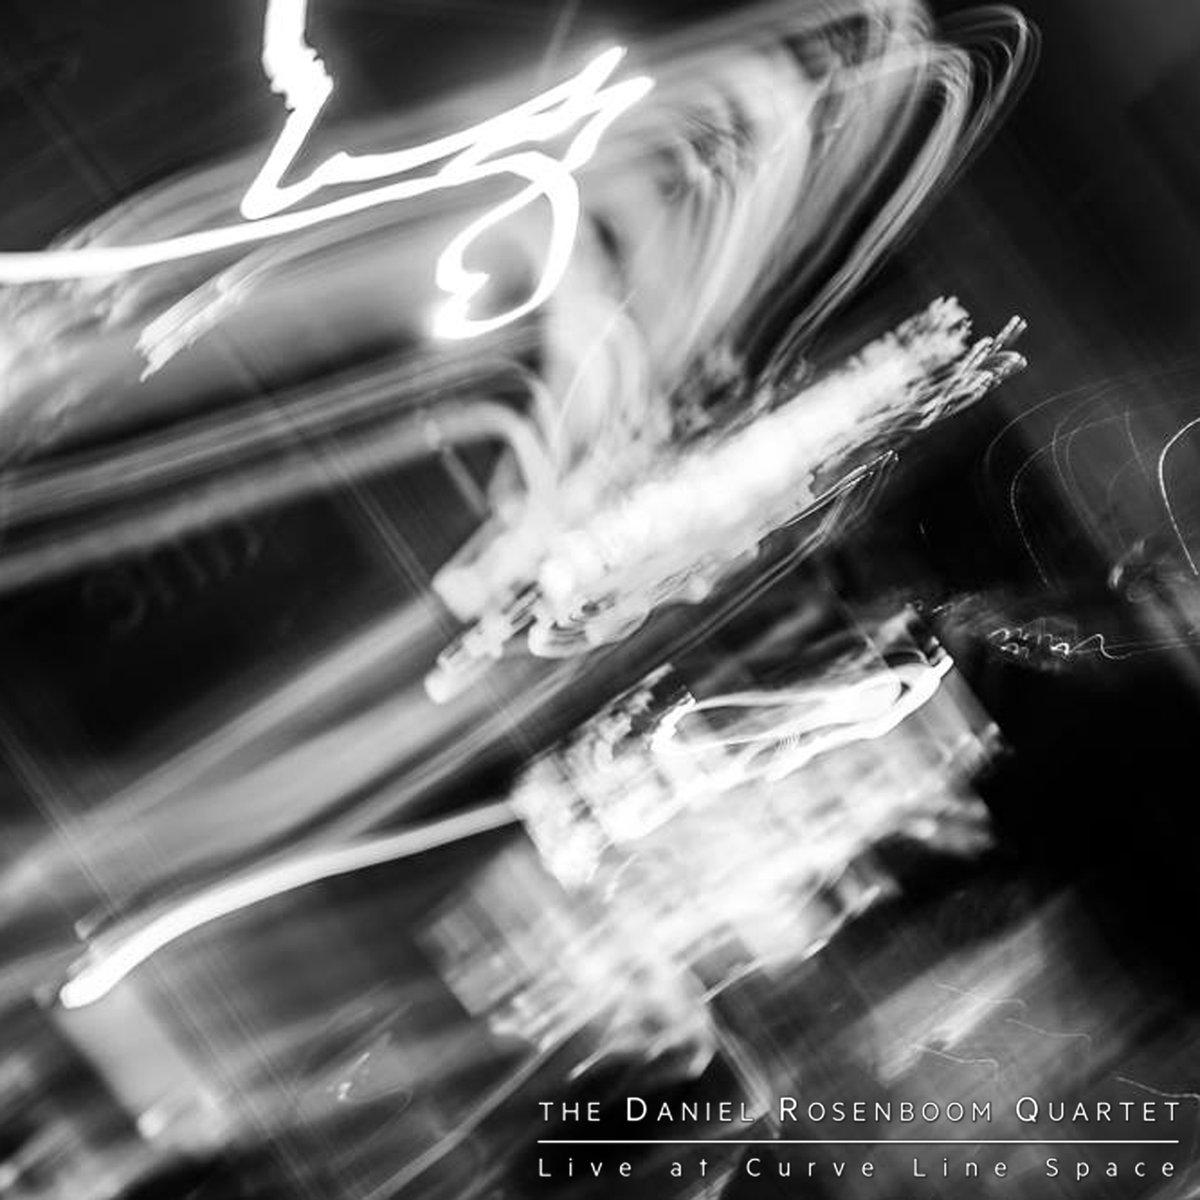 The Daniel Rosenboom Quartet // Live at Curve Line Space